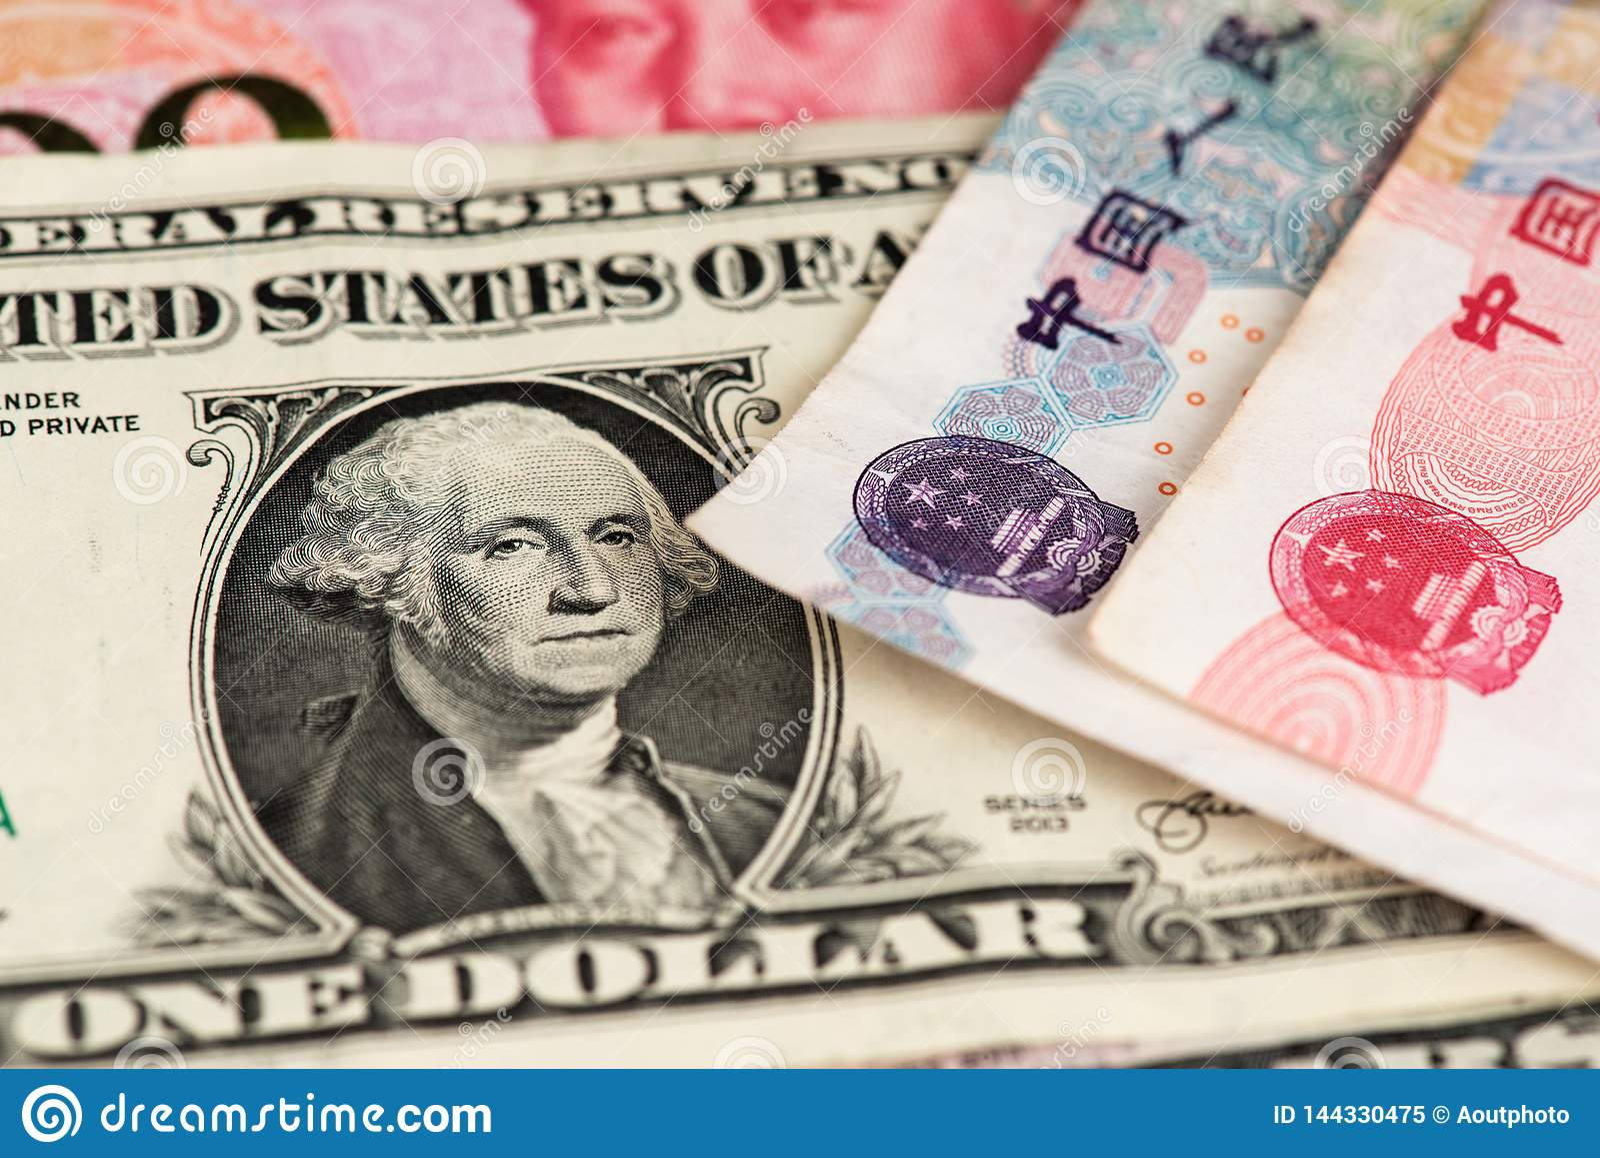 One Dollar And Yuan Renminbi China Currency Banknotes Close Up Image Usd Vs Rmb Stock Image Image Of Chinese Dollar 144330475